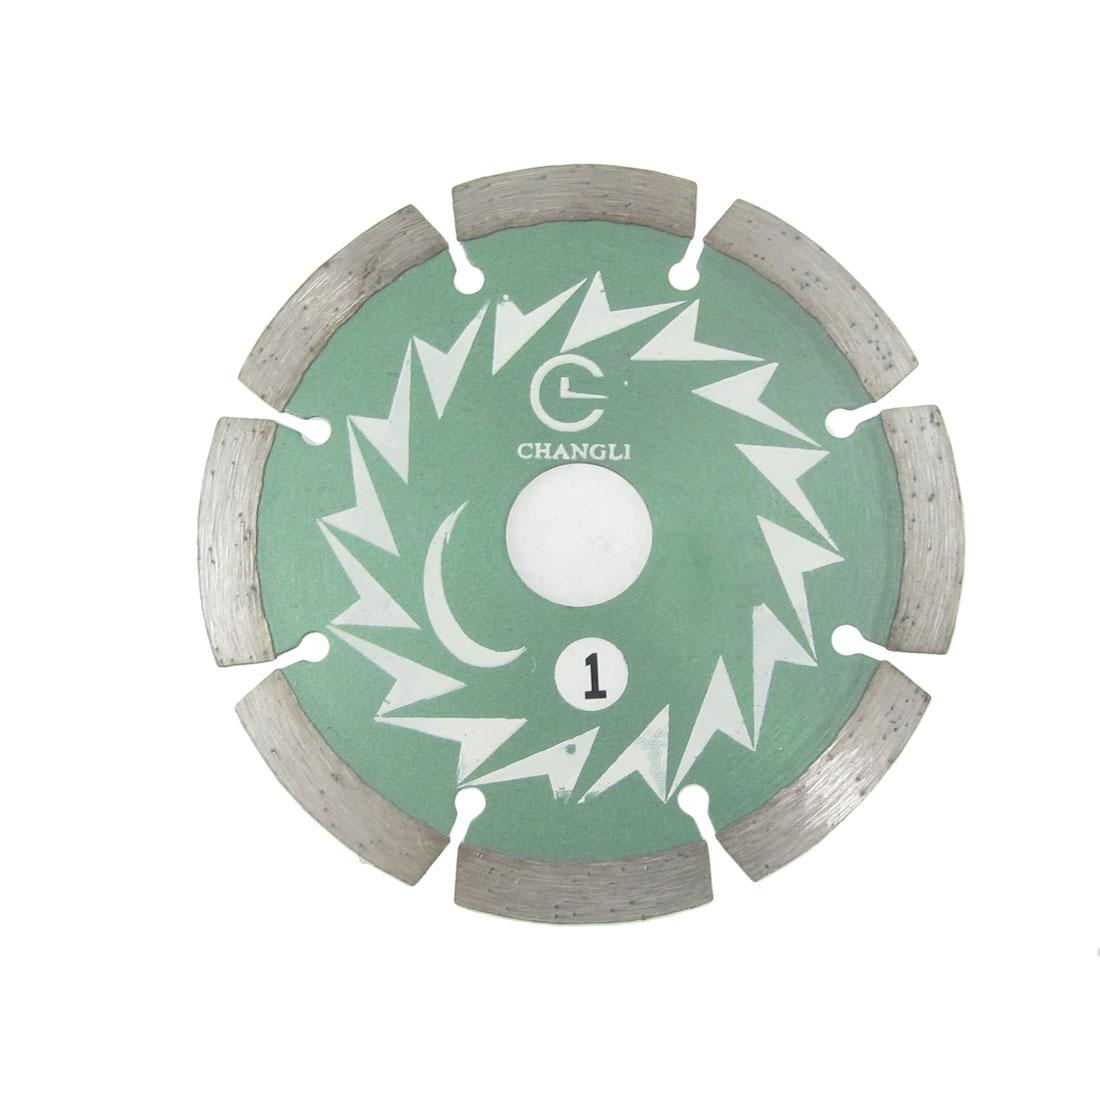 Silver Tone Kerf 105# Industrial Cutter Brick Saw Blade Bit